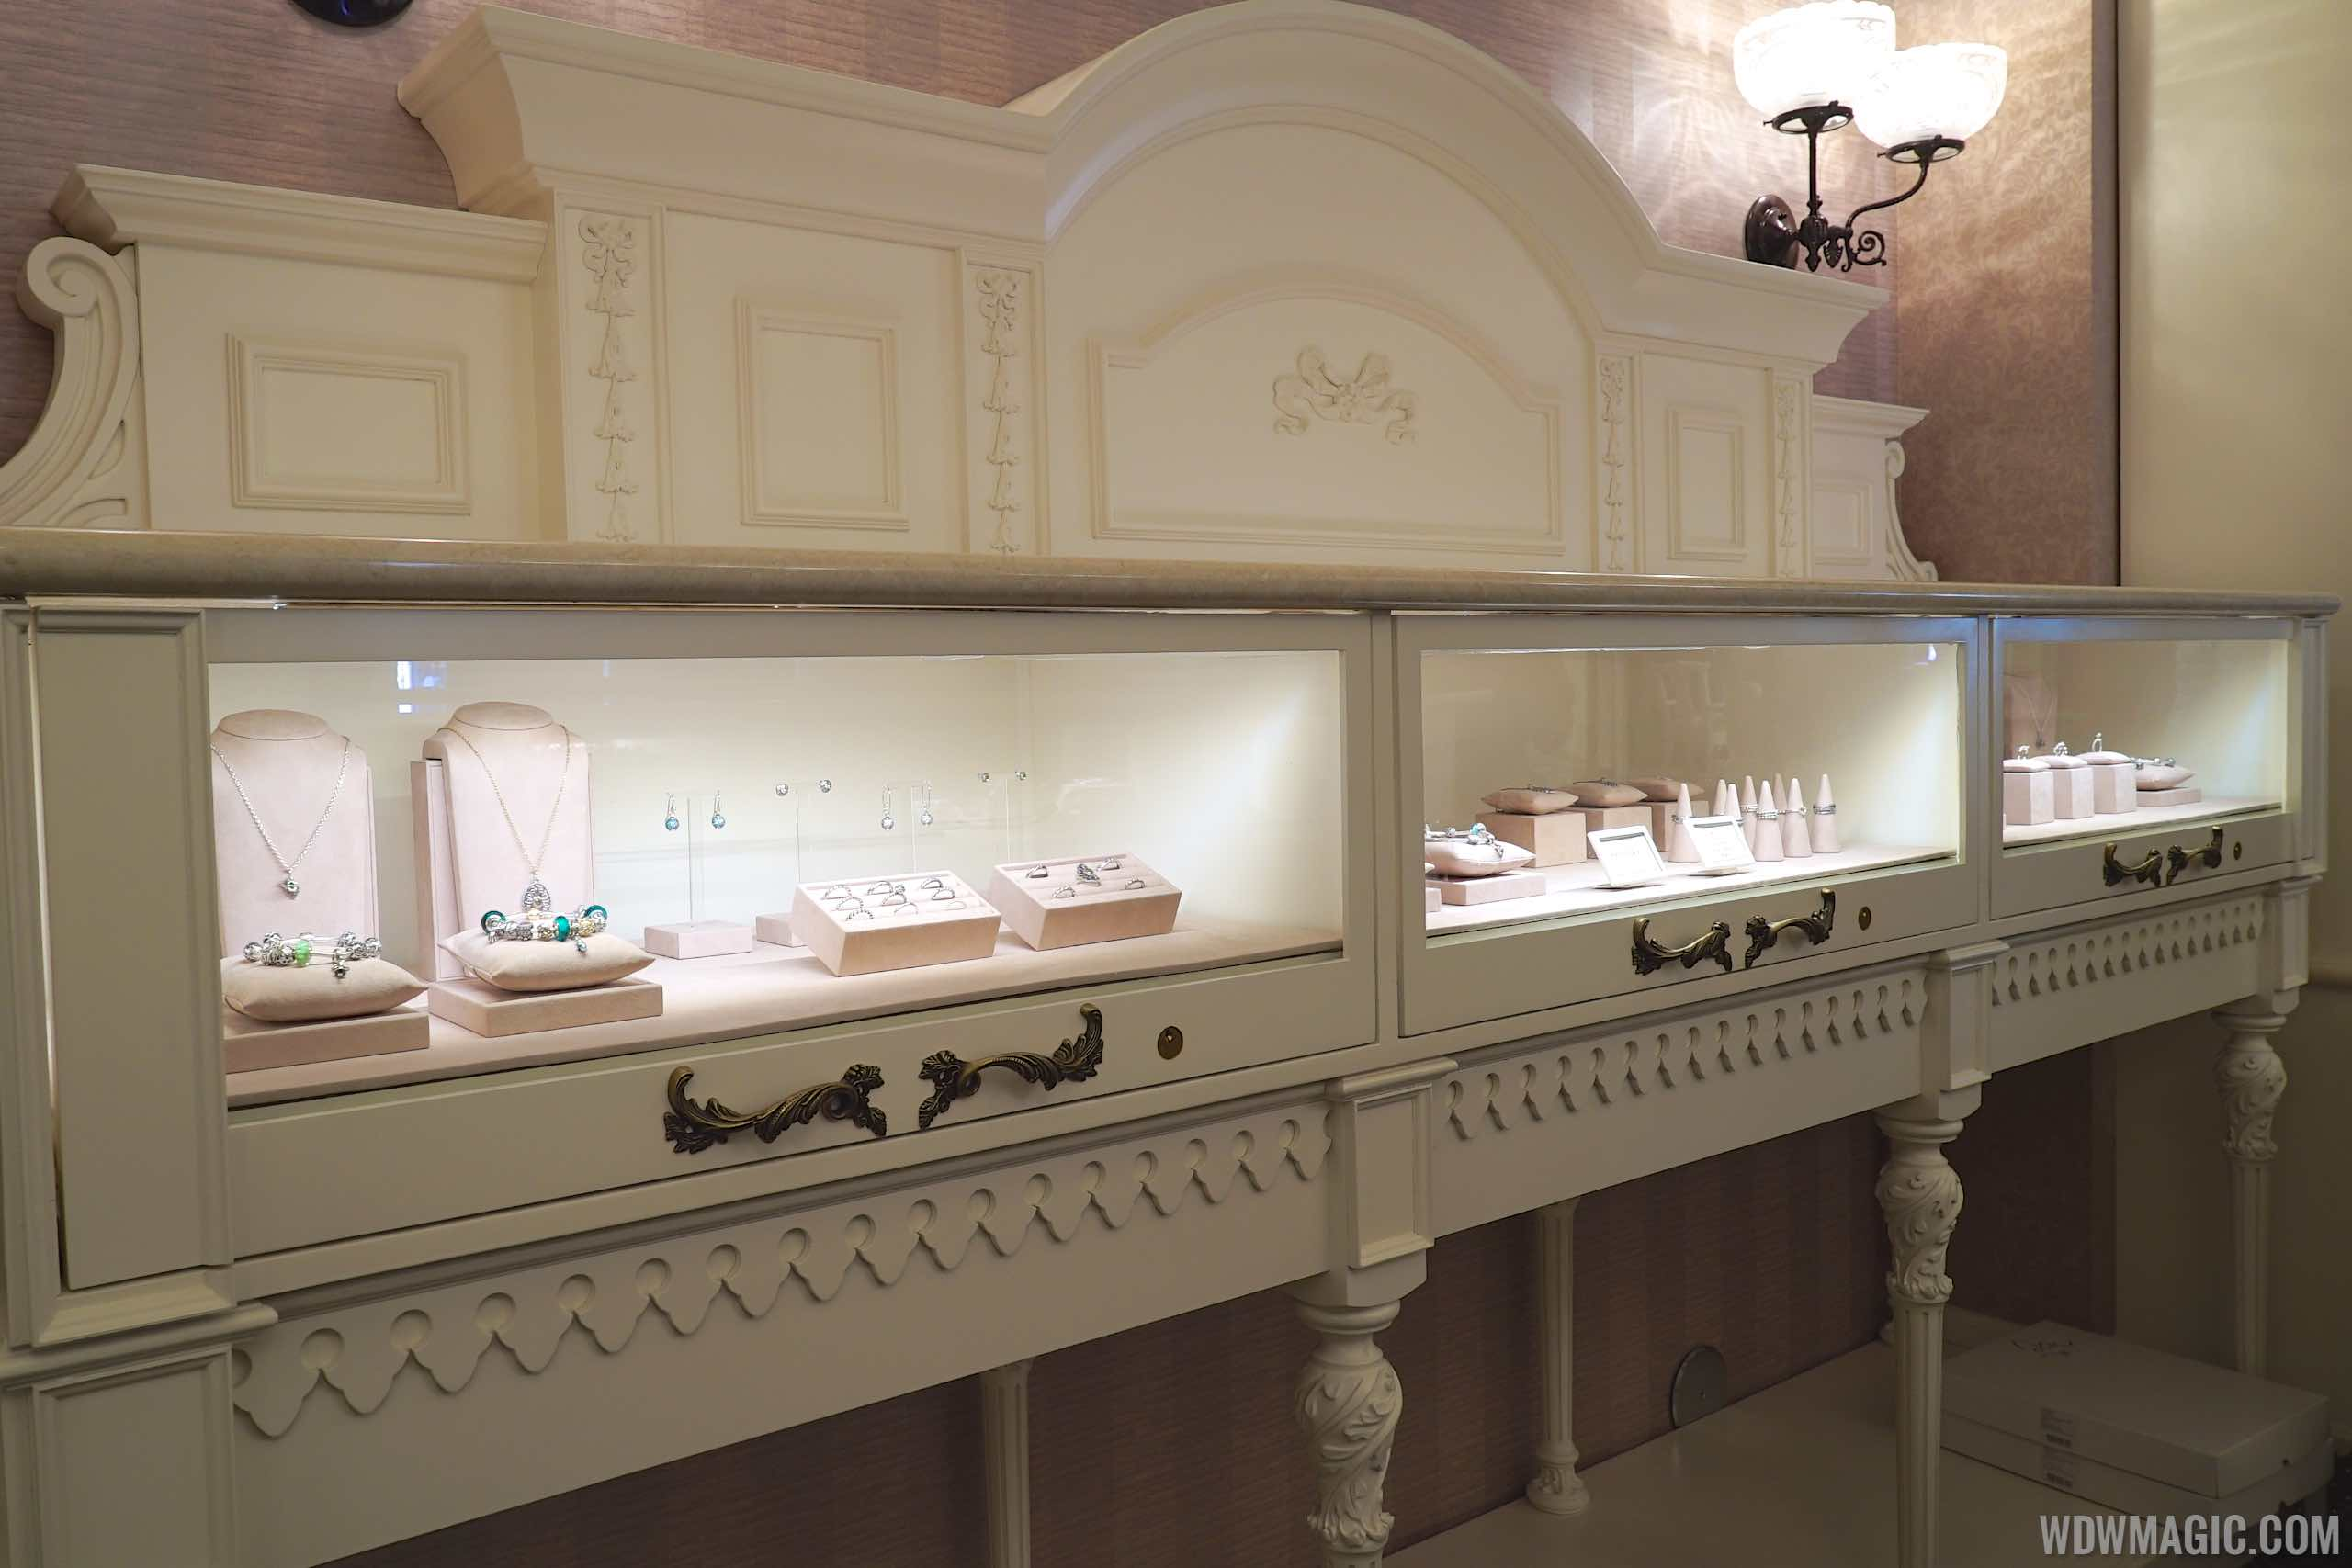 Pandora at Uptown Jewelers